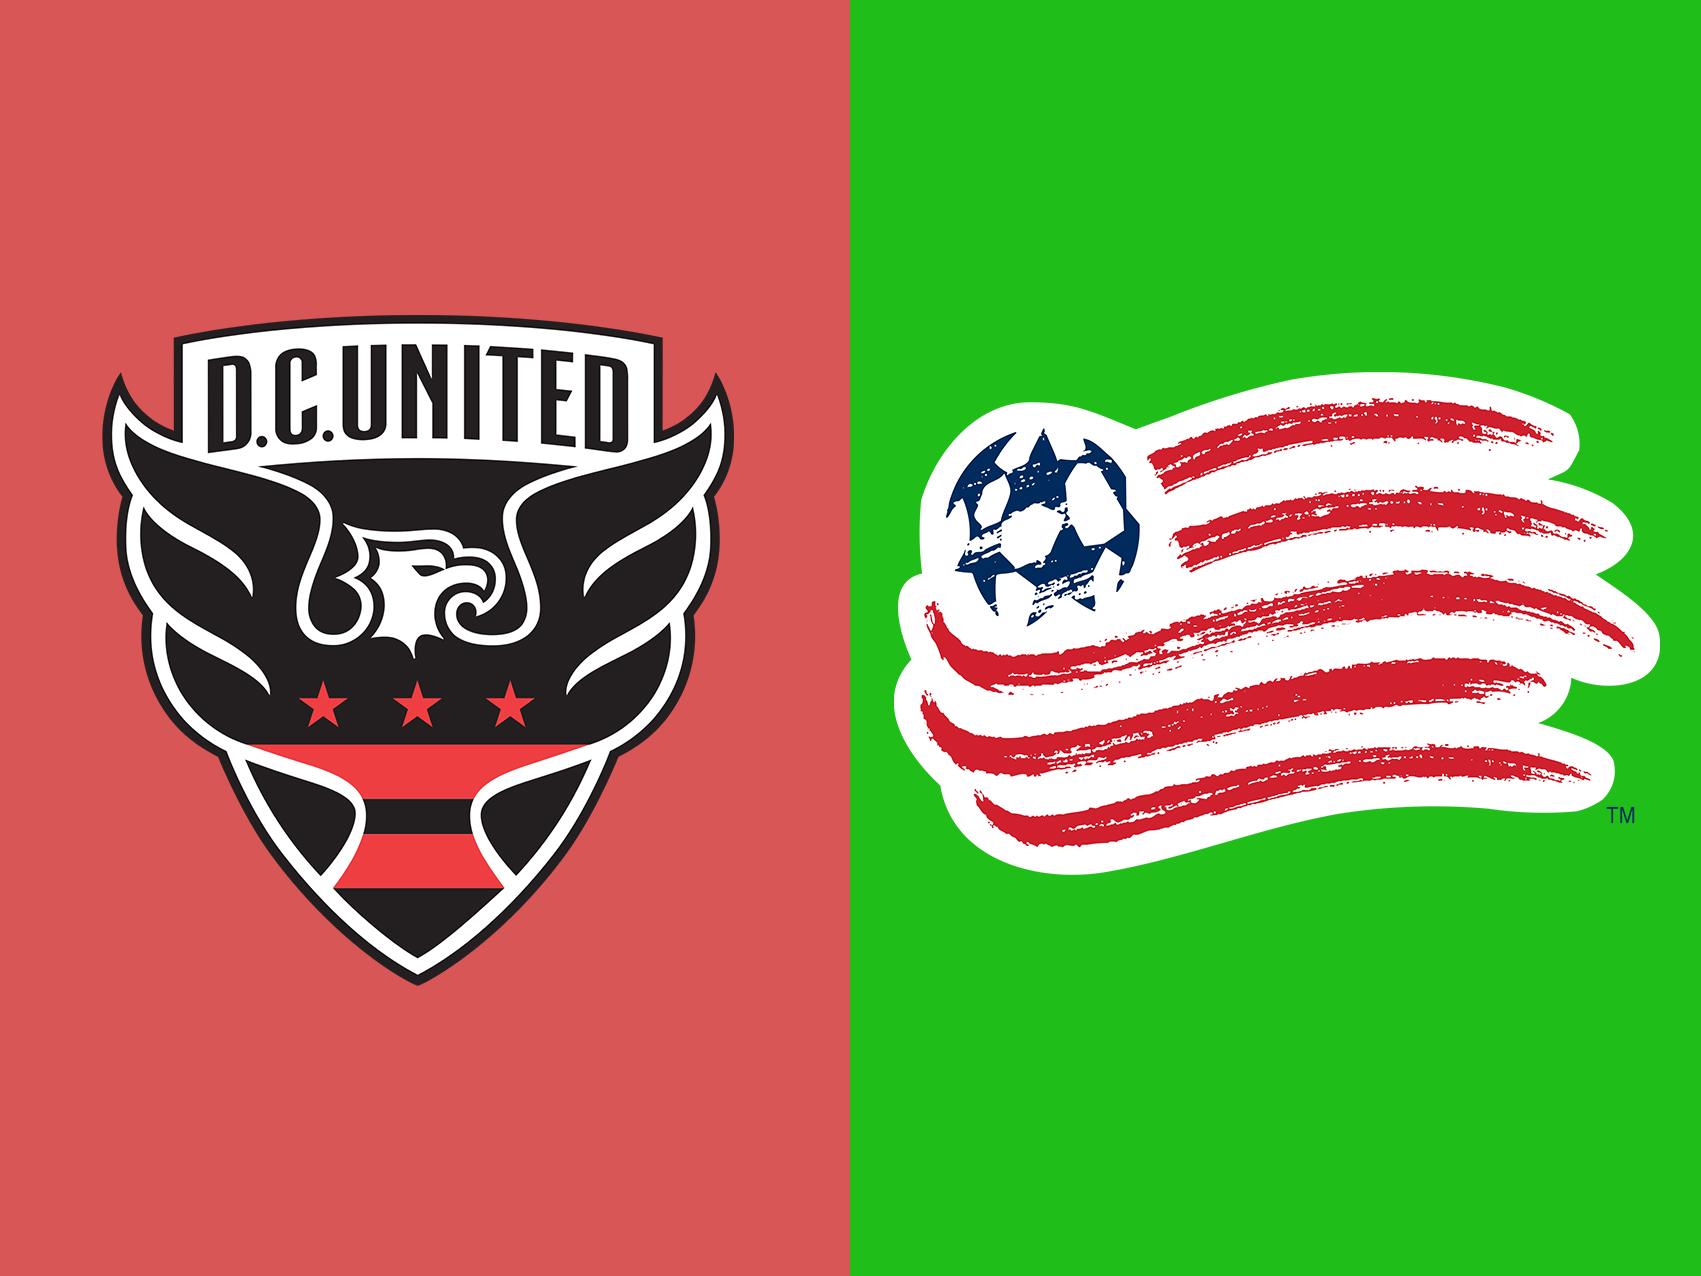 soi-keo-ca-cuoc-bong-da-ngay-13-7-dc-united-vs-new-england-revolution-chu-nha-kho-thang-b9 1